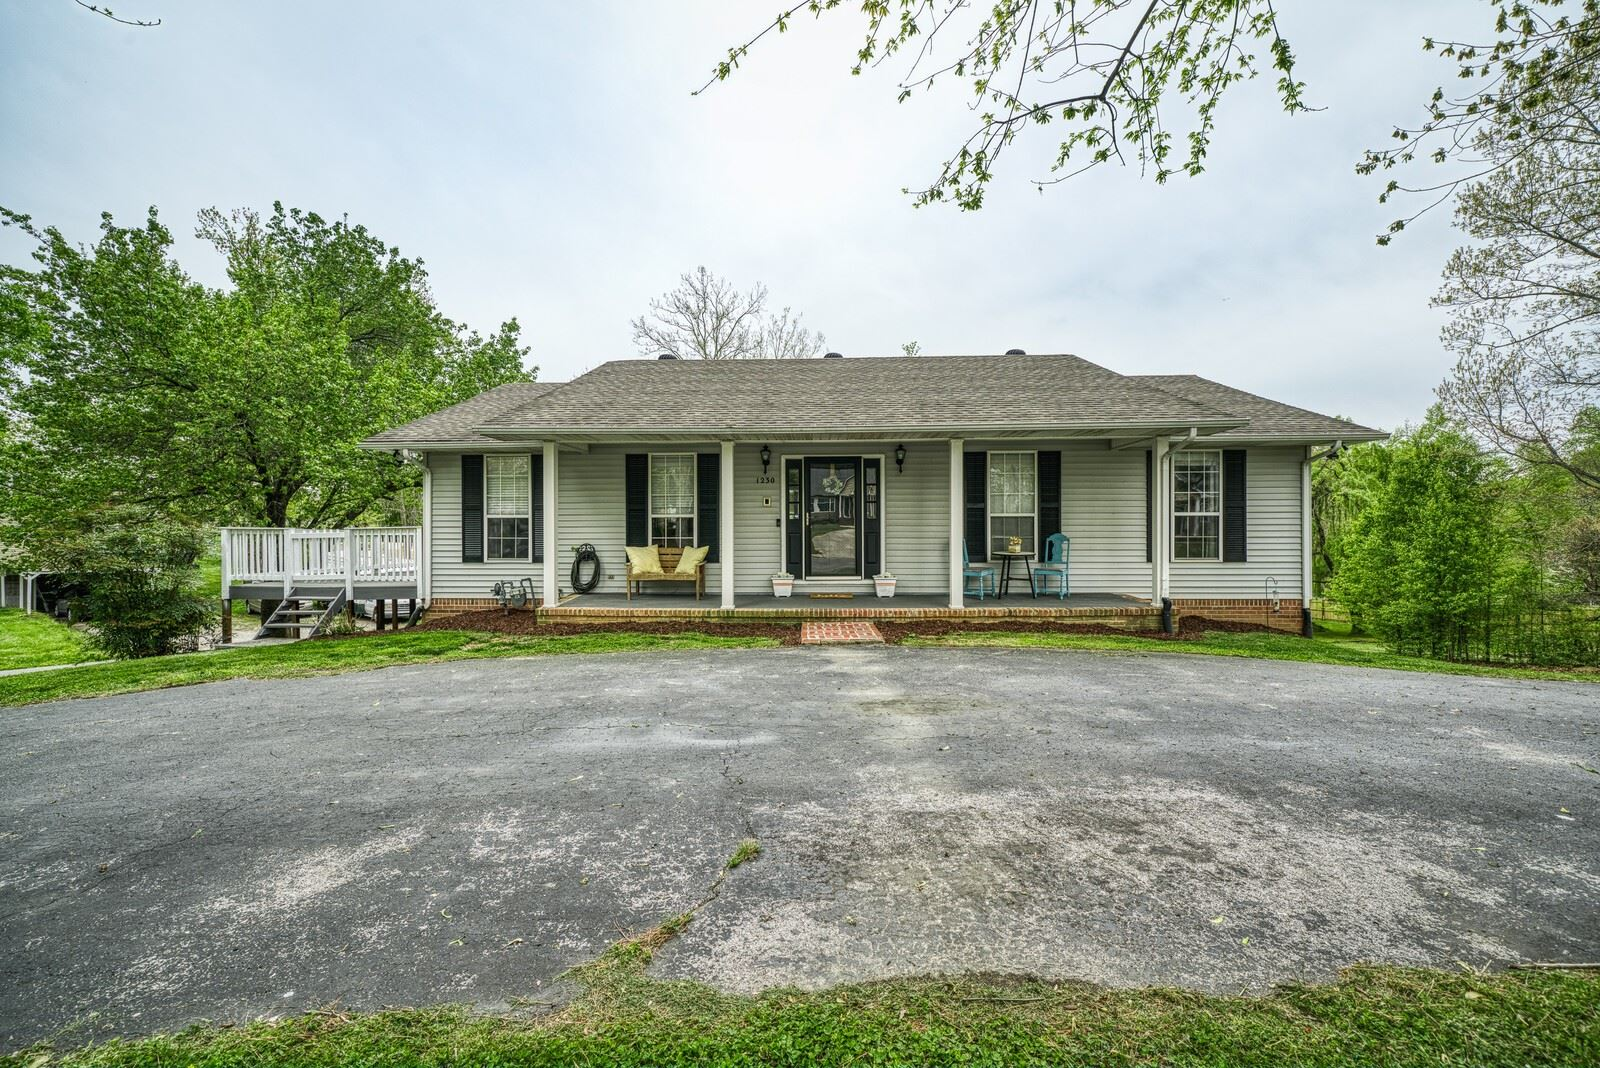 1230 Crescent Dr, Cookeville, TN 38501 - MLS#: 2245164